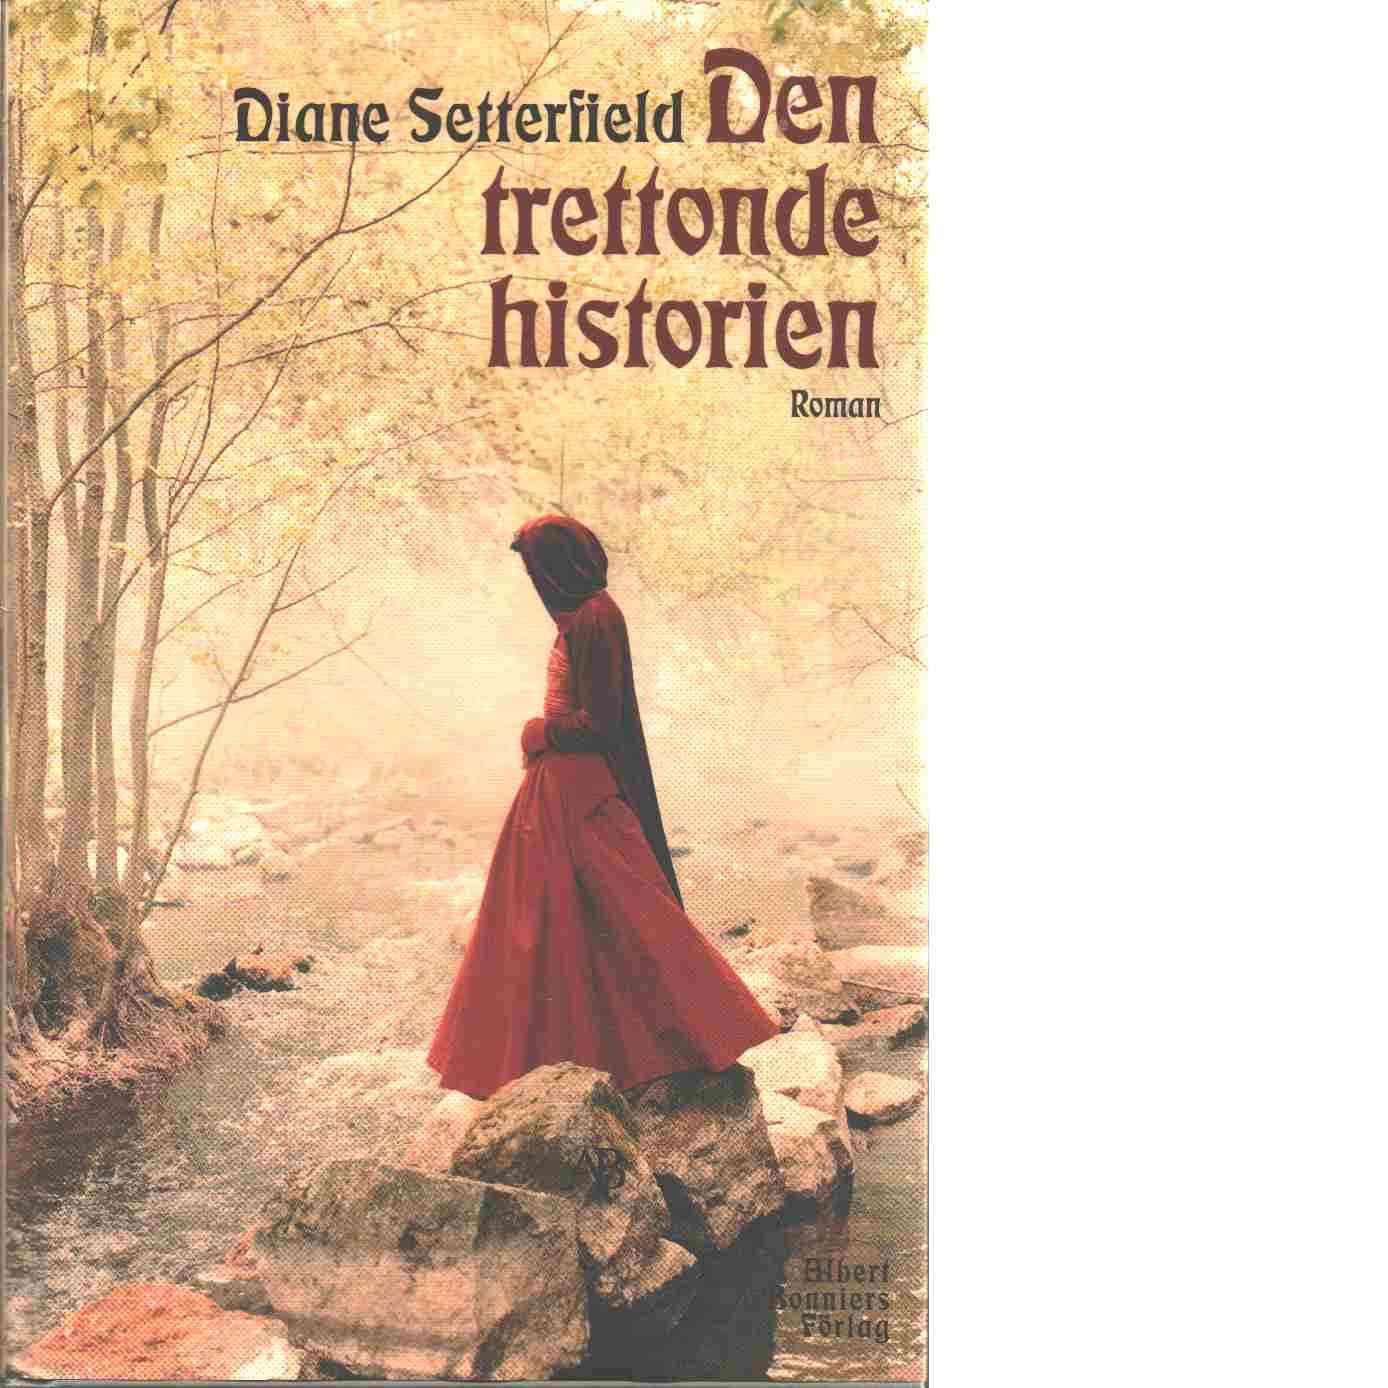 Den trettonde historien - Setterfield, Diane